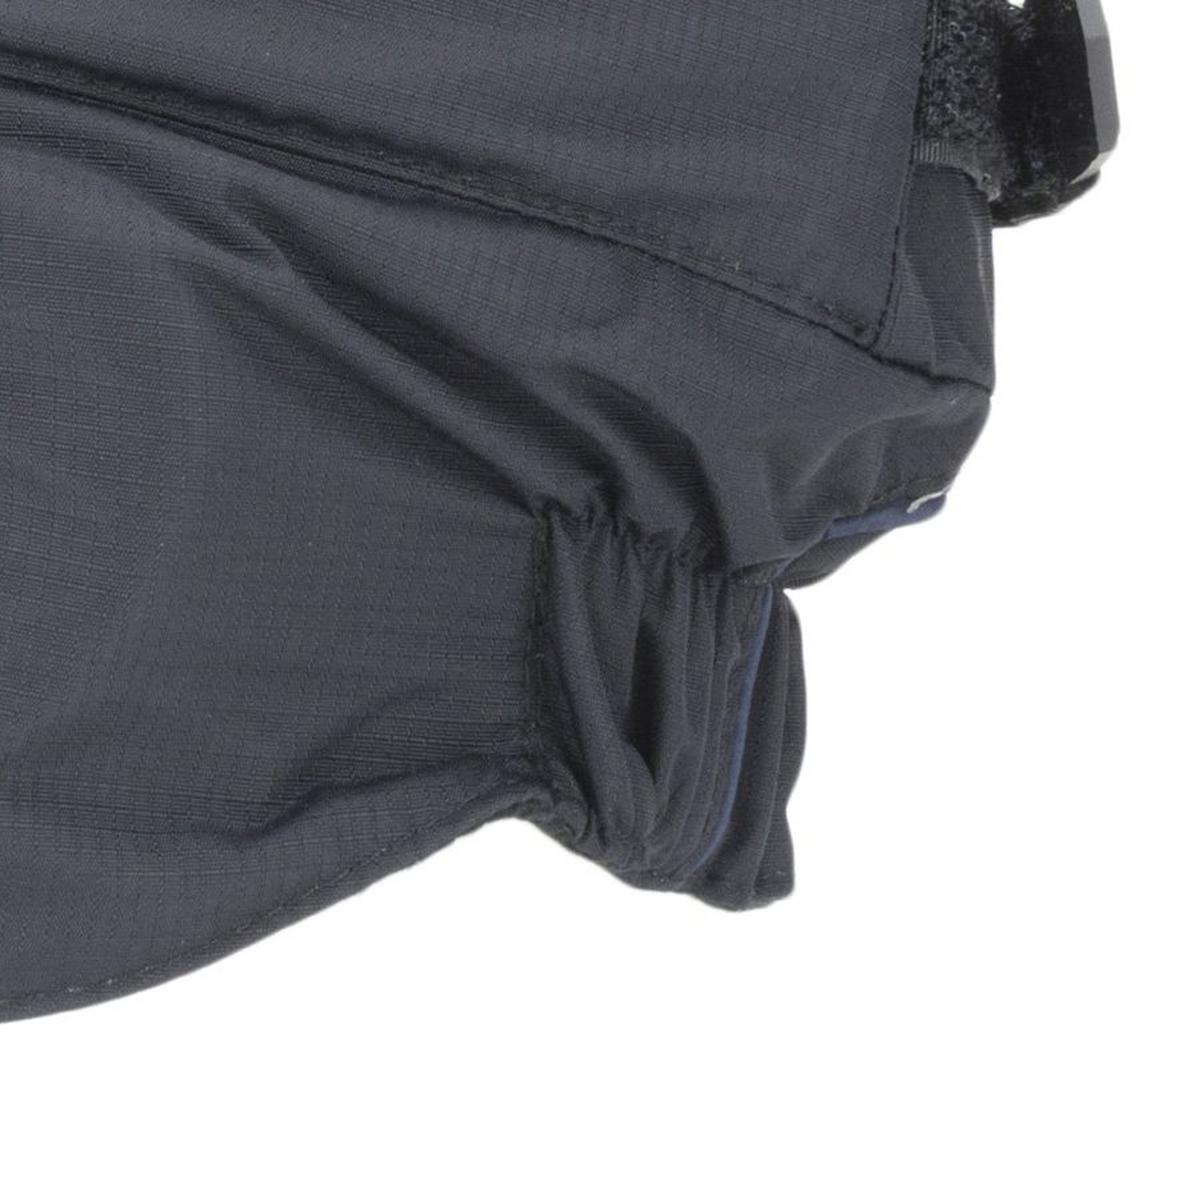 Sealskinz Unisex Sealskinz Waterproof Extreme Cold Weather Hat - Black